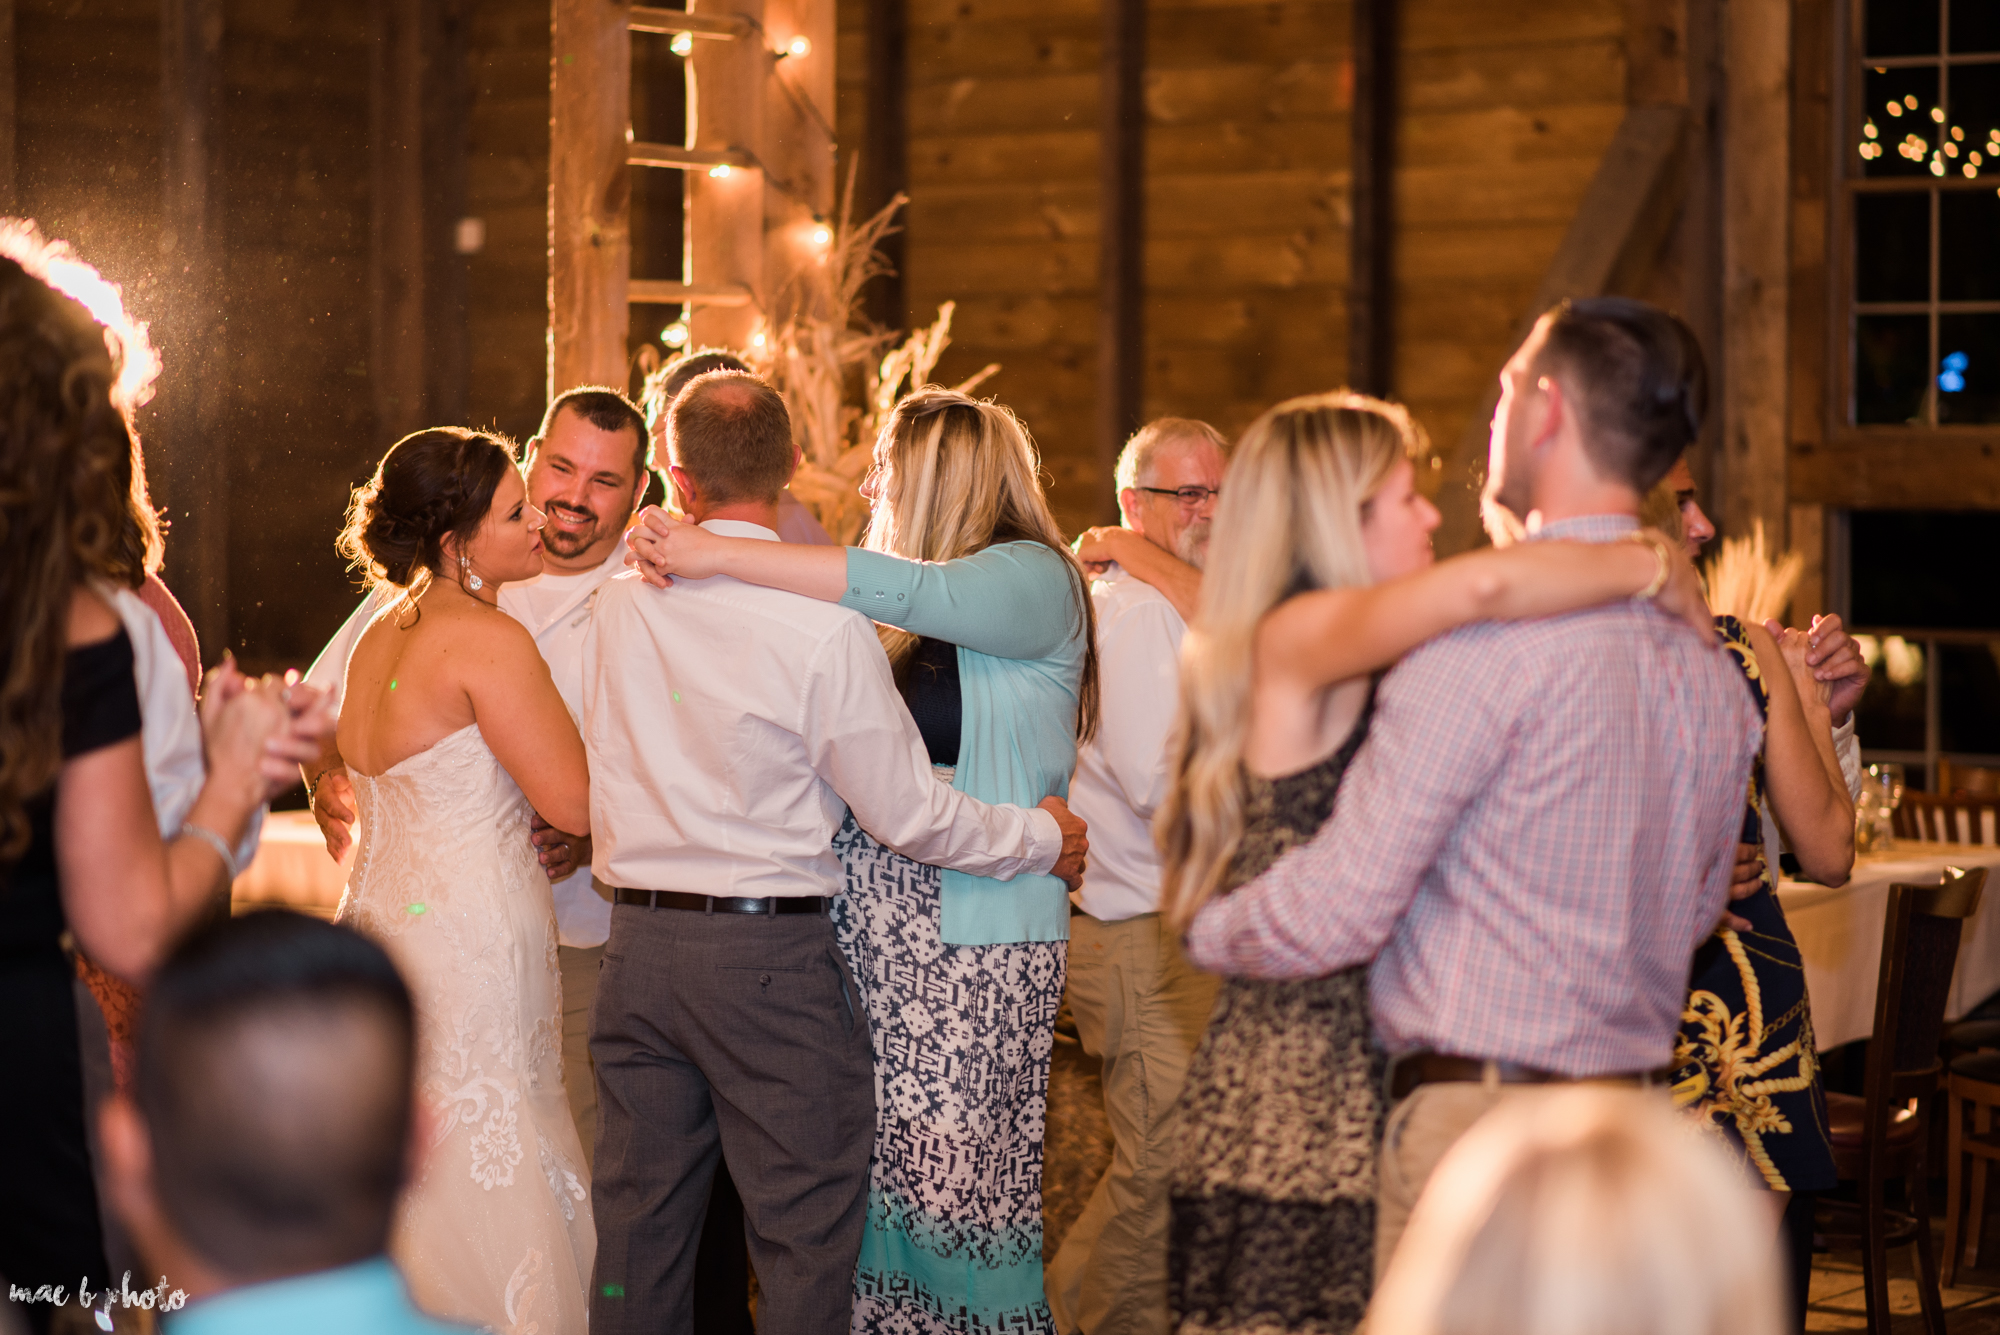 Sarah & Dustin's Rustic Chic Barn Wedding at Hartford Hill Winery in Hartford, Ohio by Mae B Photo-115.jpg